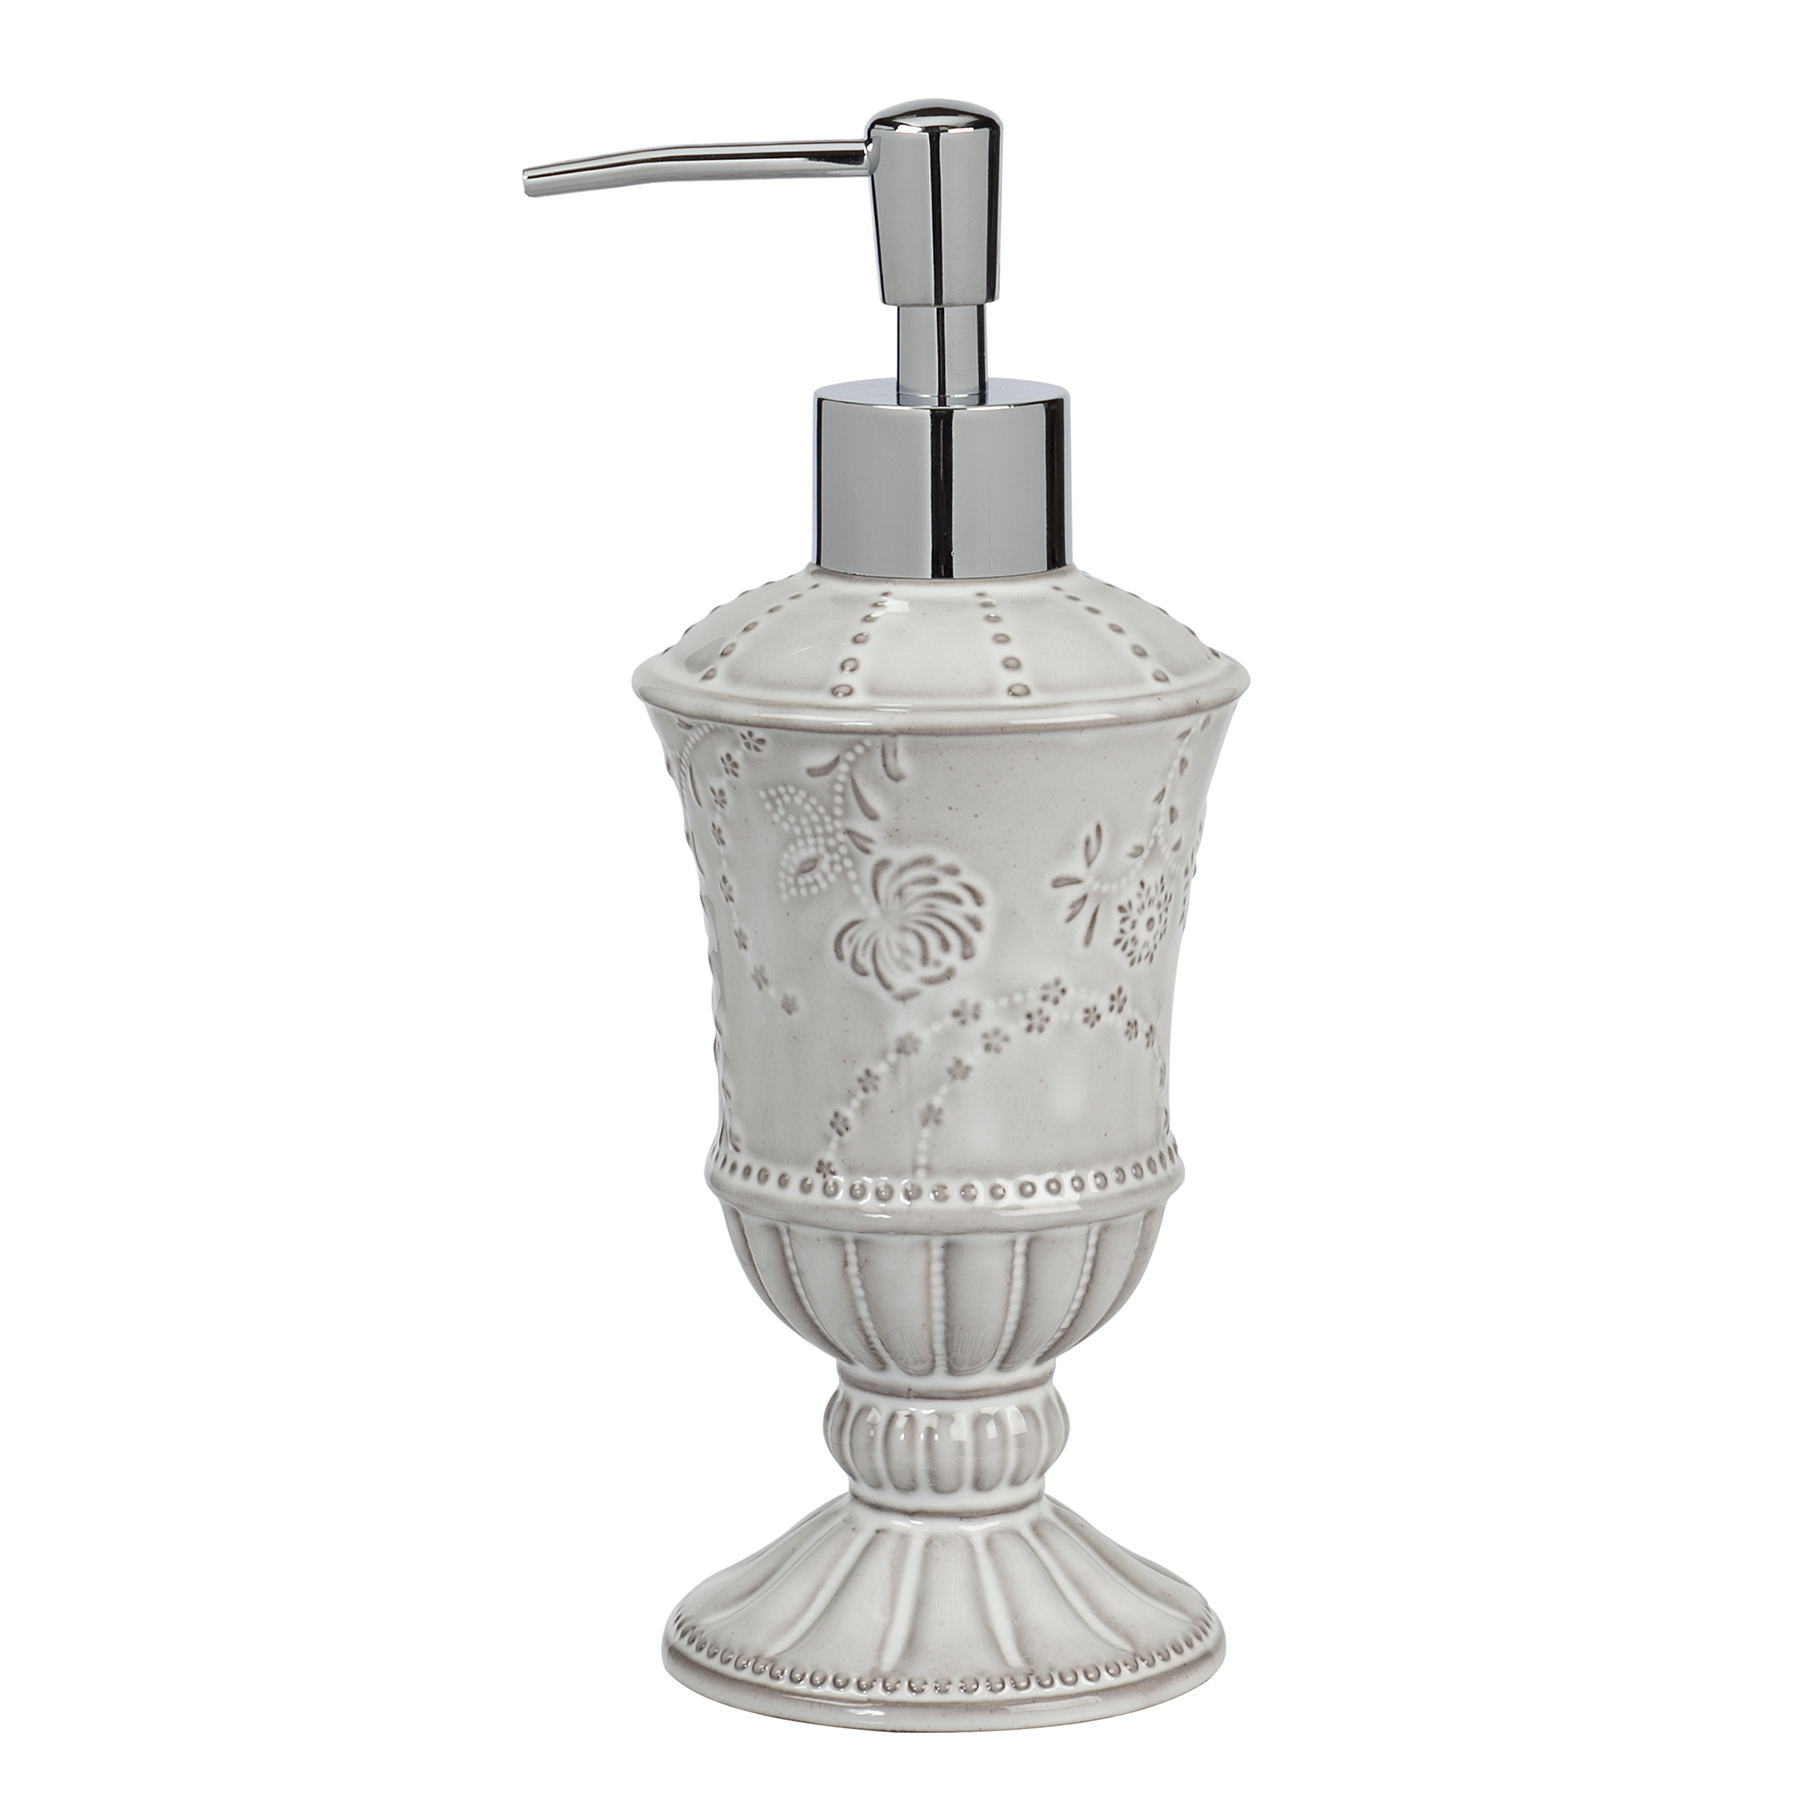 Дозаторы для мыла Дозатор для жидкого мыла Creative Bath Eyelet dozator-dlya-zhidkogo-myla-eyelet-ot-creative-bath-ssha-kitay.jpg